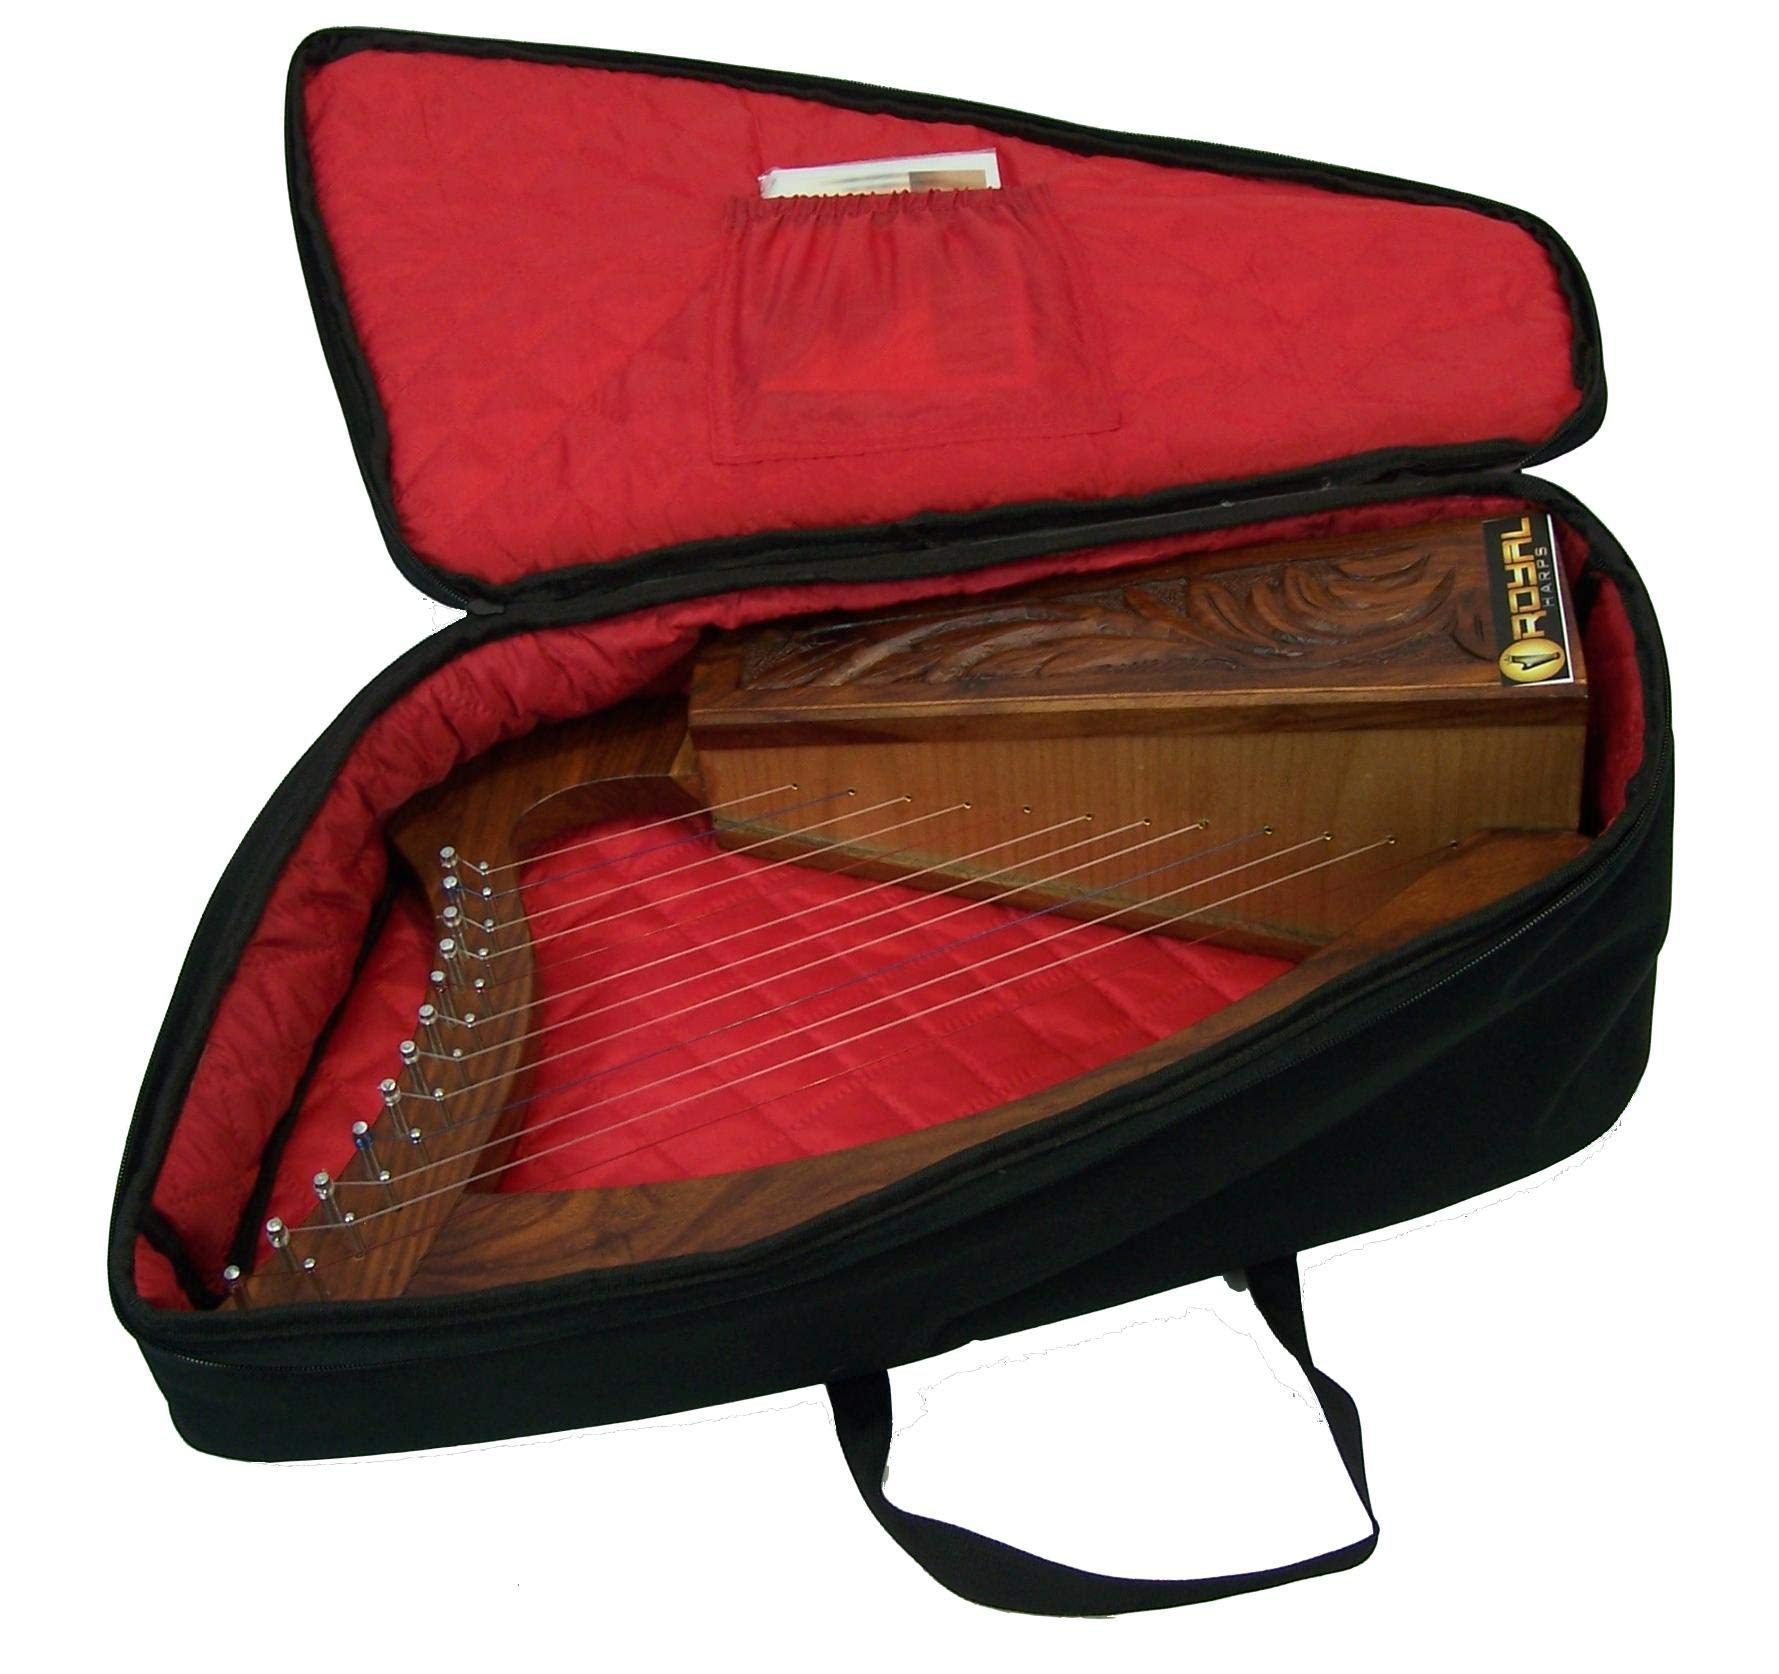 Celtic Irish Baby Harp 12 Strings Solid Wood Free Bag Strings Key by ROYAL HARPS (Image #2)